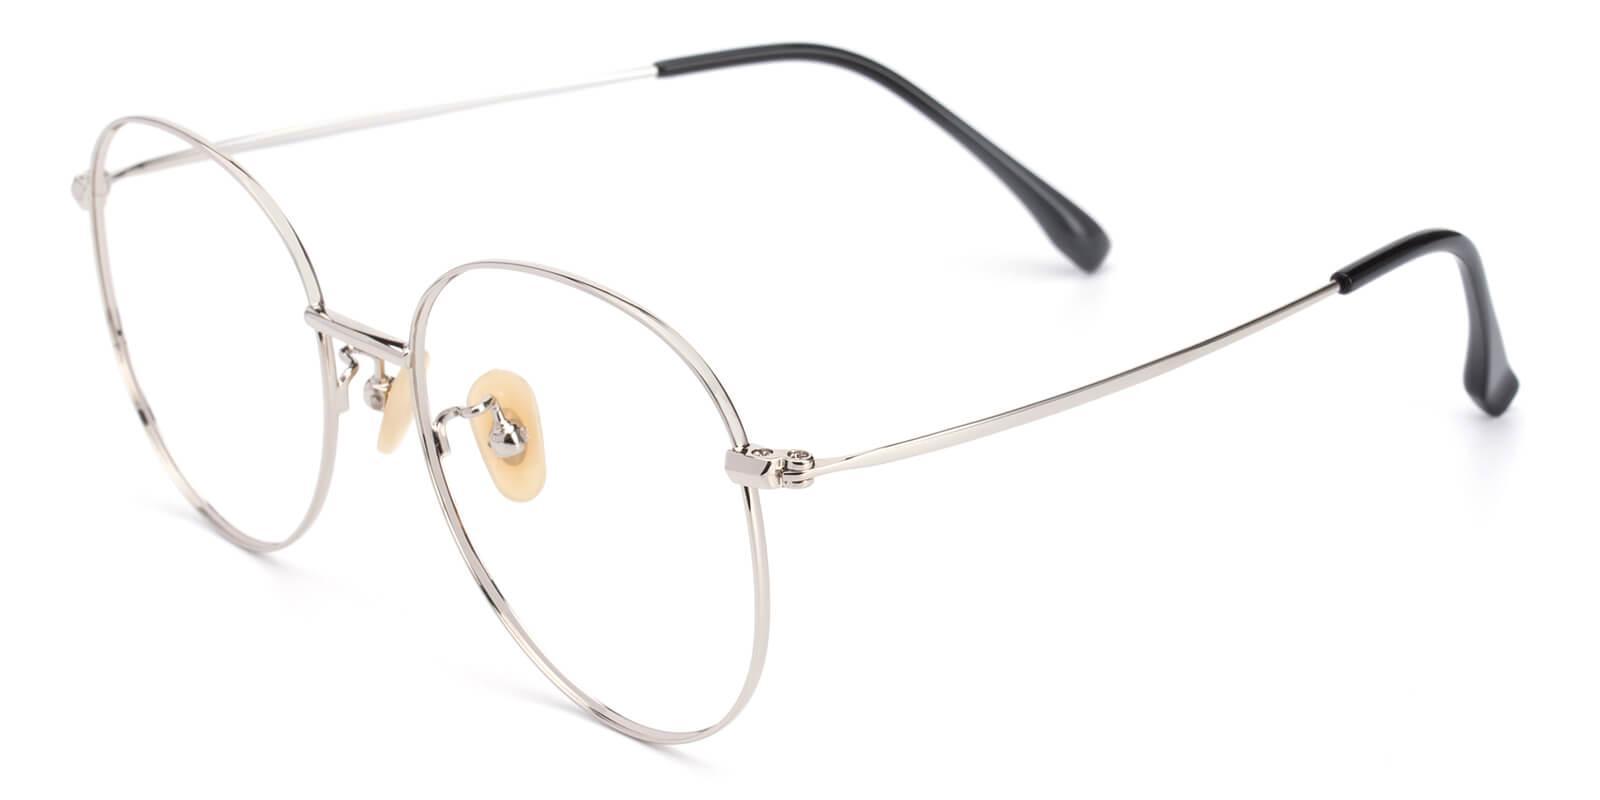 Epilogue-Silver-Round-Titanium-Eyeglasses-additional1